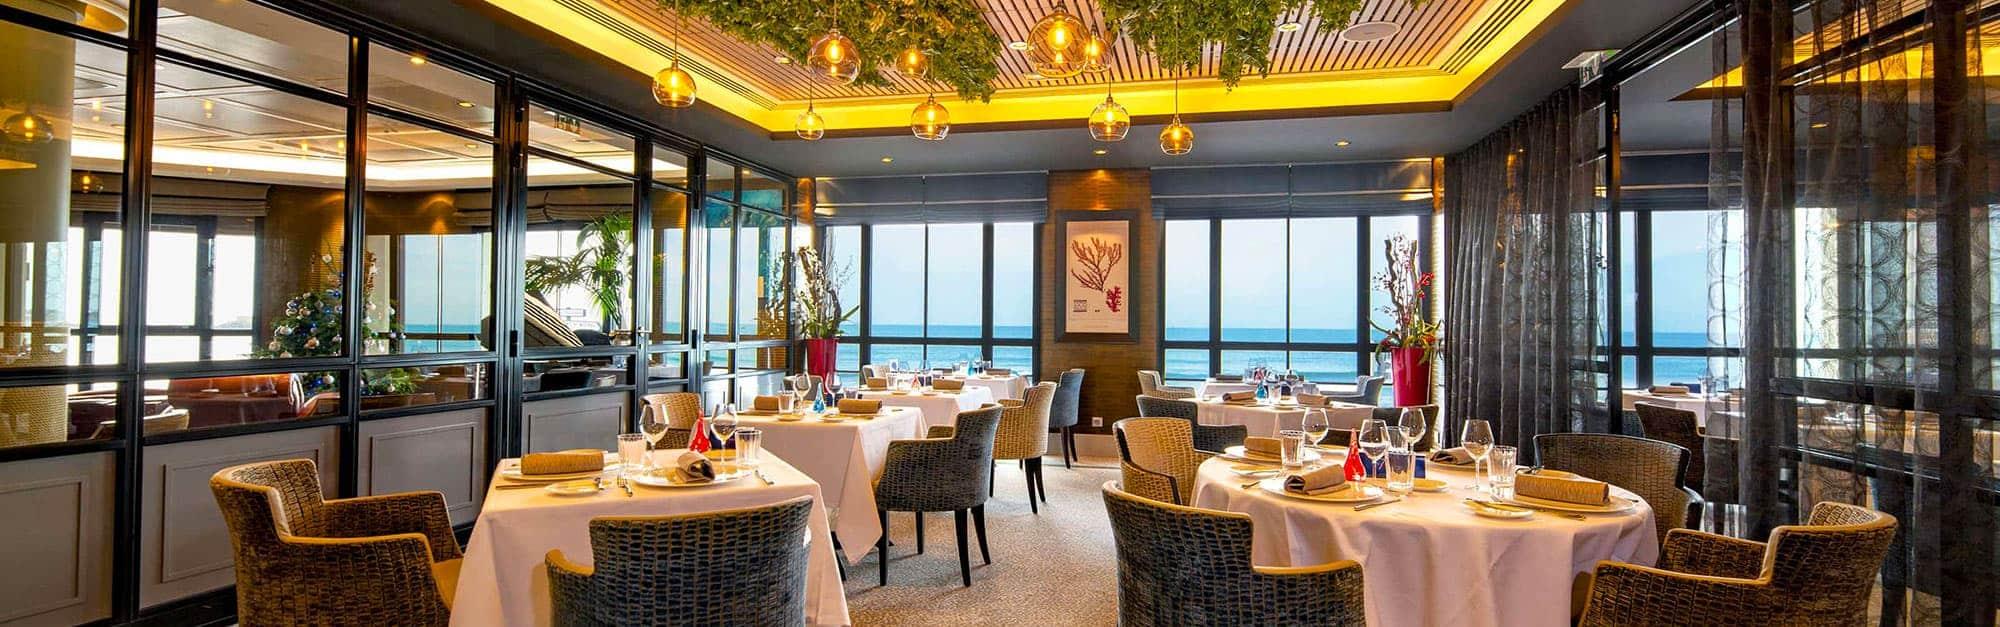 Restaurant-7-mers